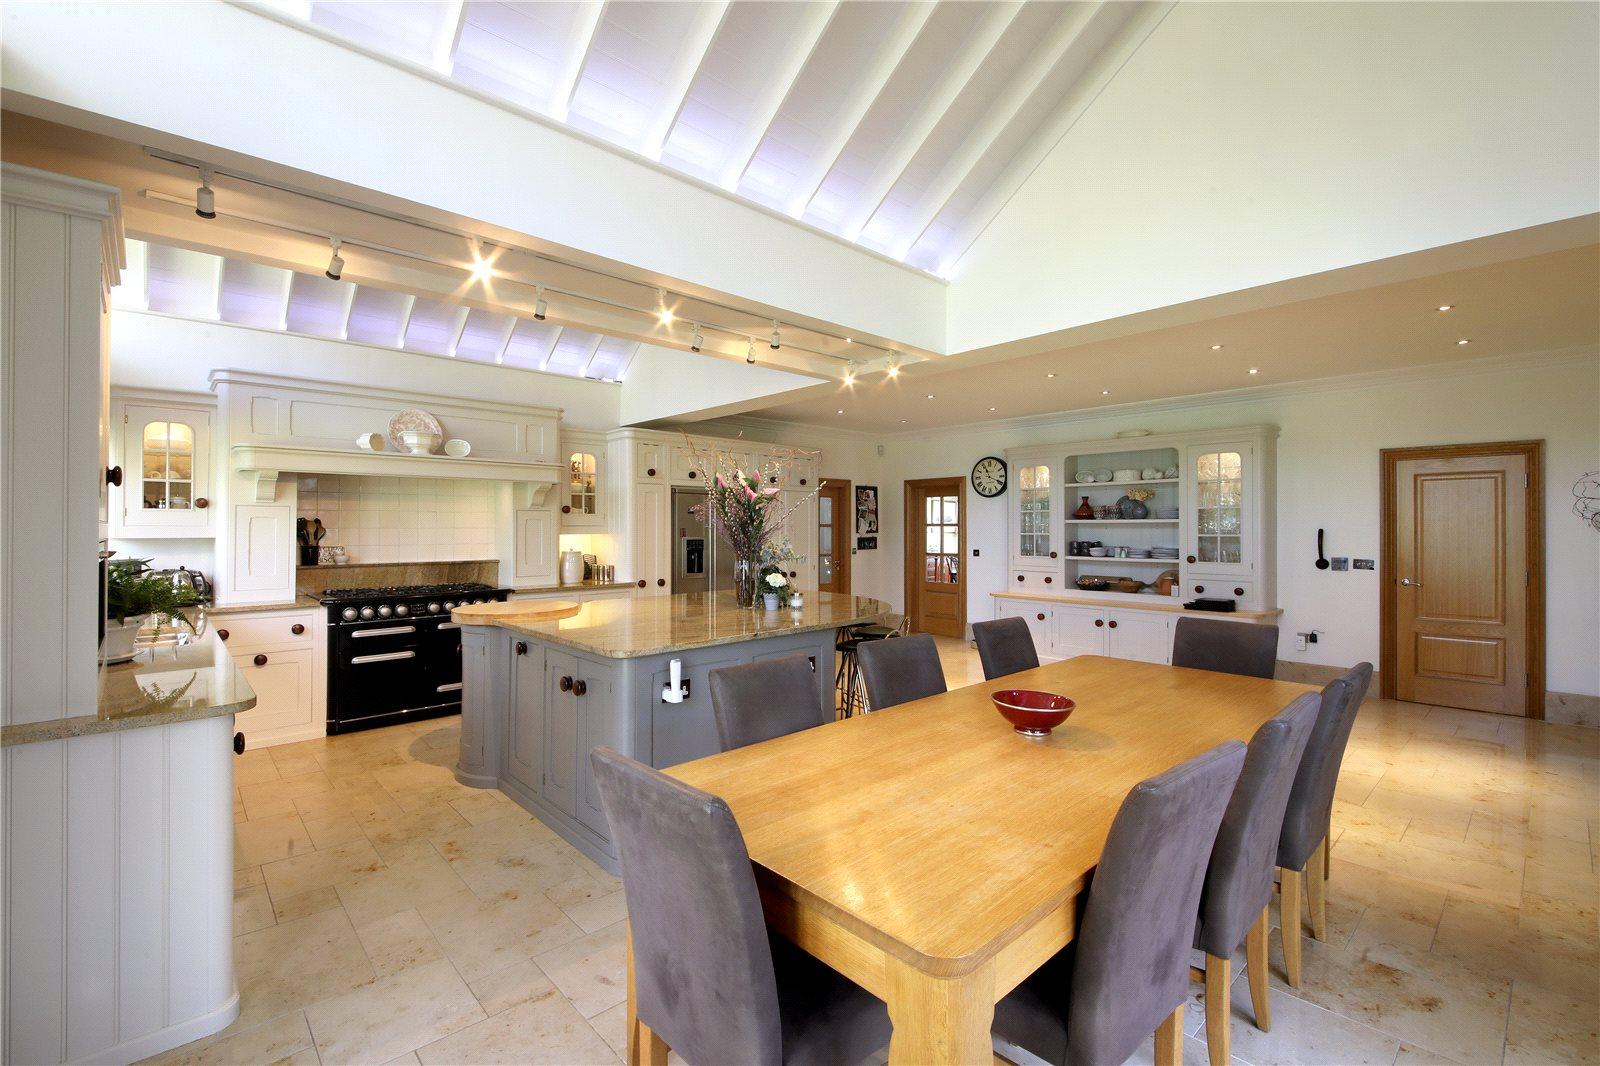 Additional photo for property listing at Kier Park, Ascot, Berkshire, SL5 Ascot, Engeland